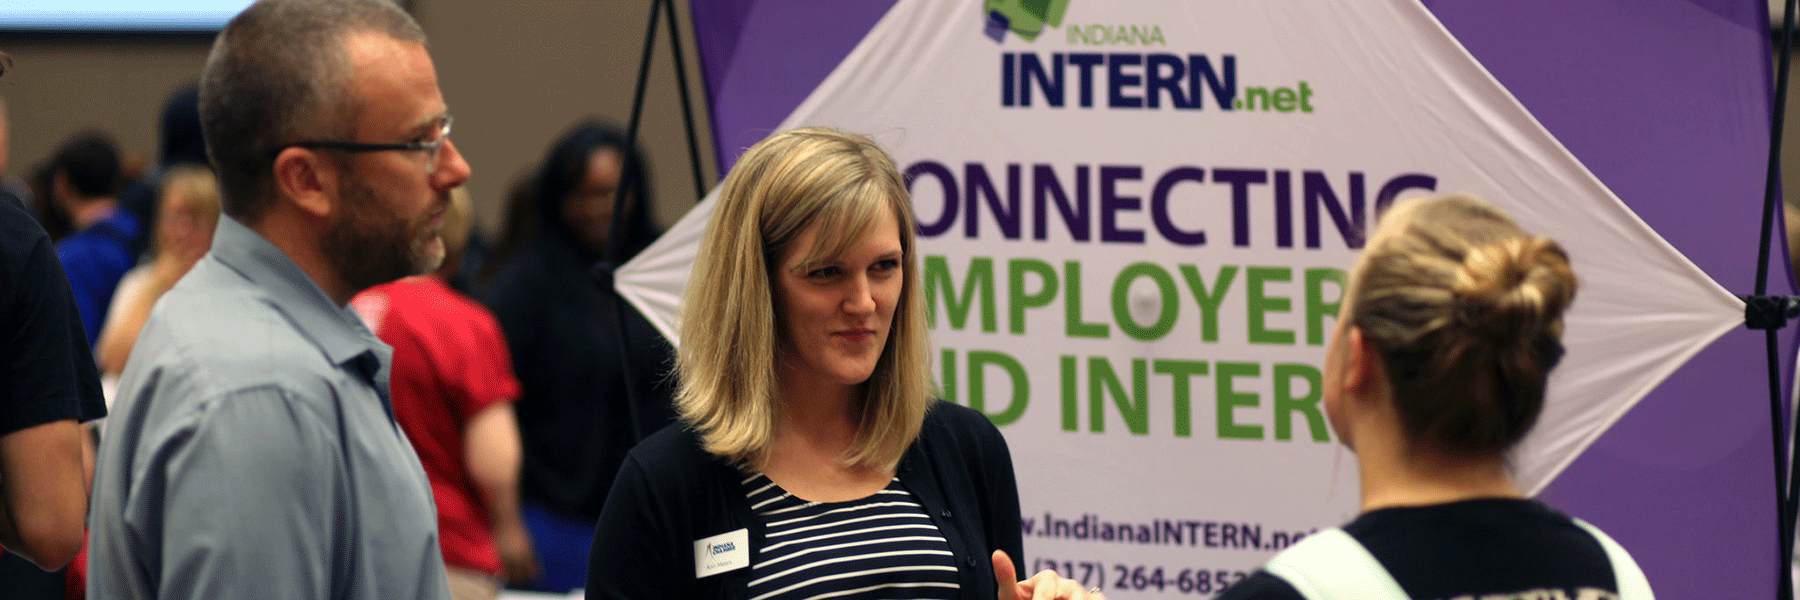 Employers Iupui Career Services Indiana Universitypurdue